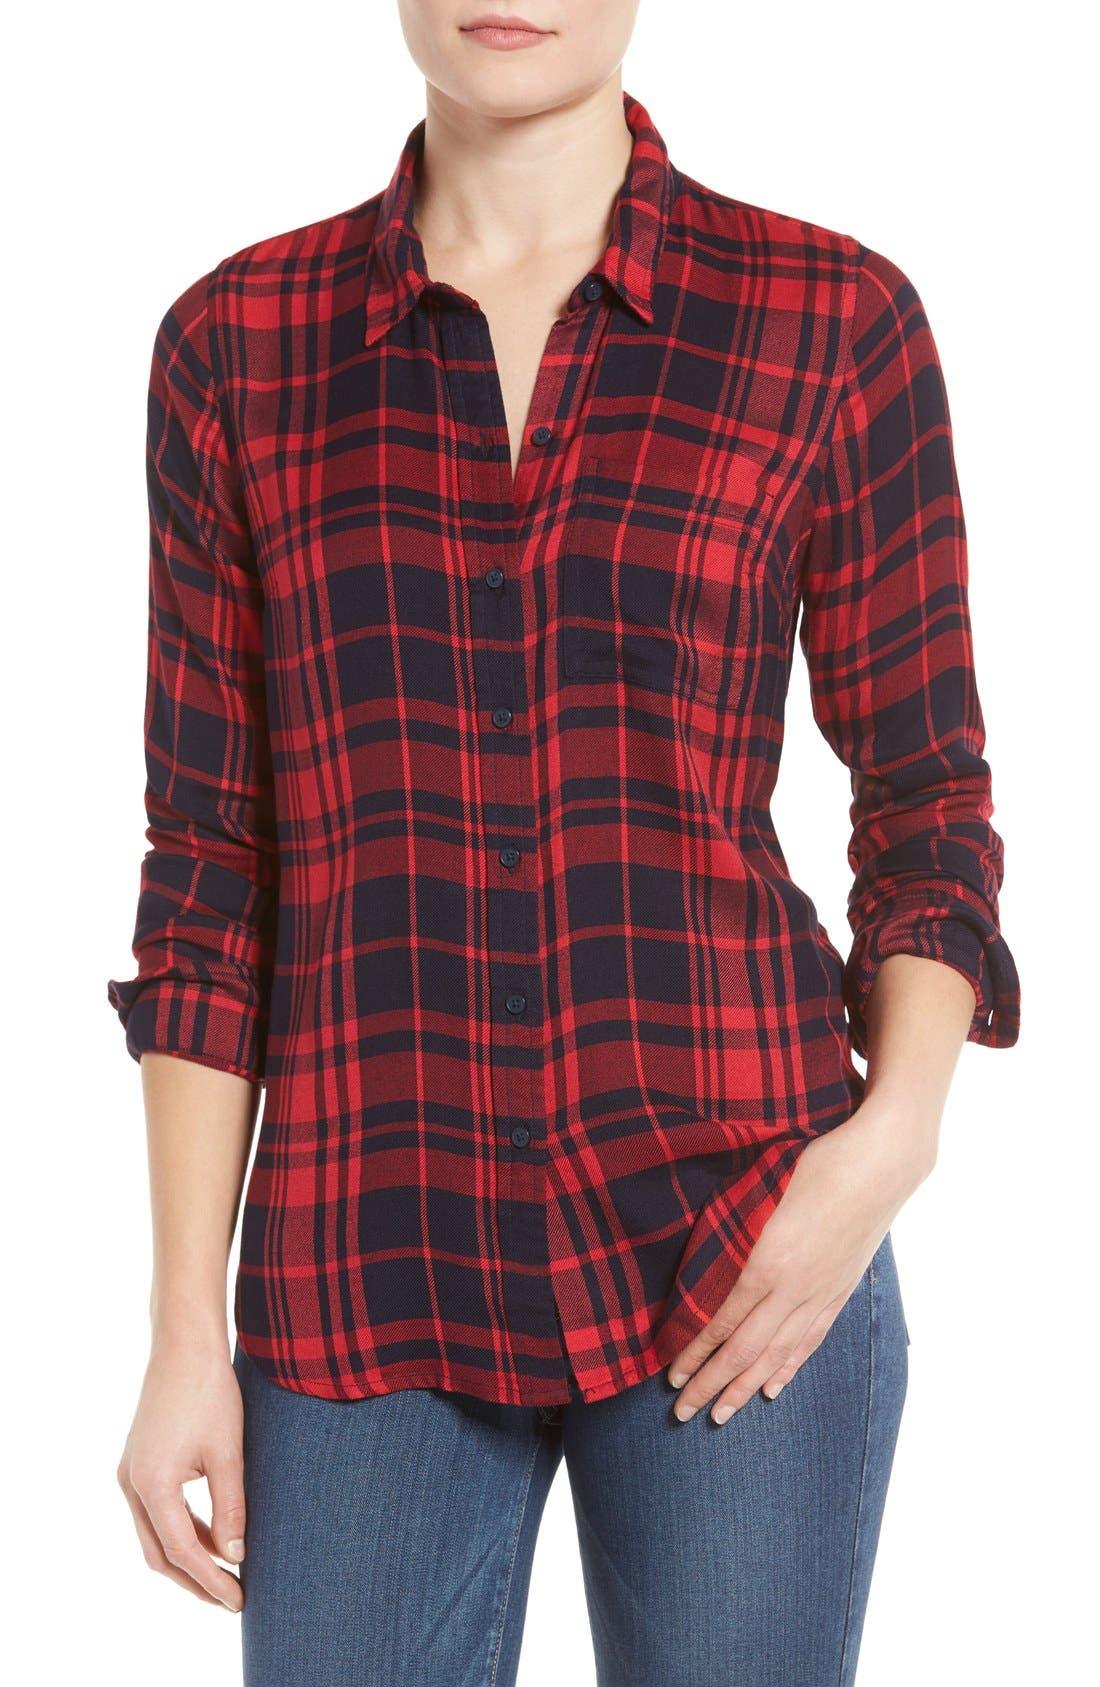 Alternate Image 1 Selected - Lucky Brand Plaid Shirt